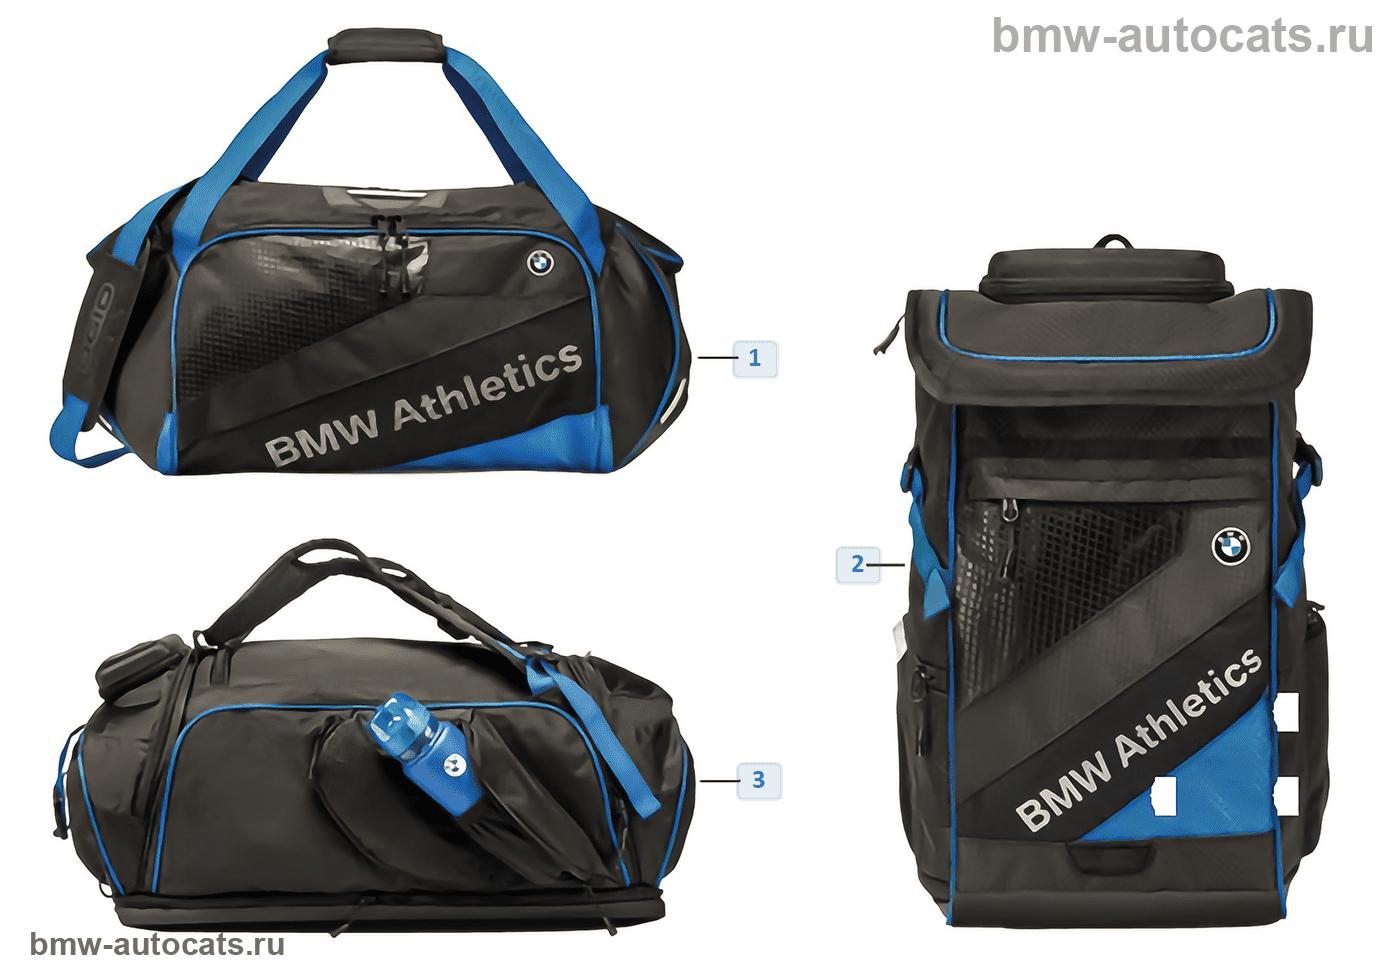 BMW Athletics — Сумки